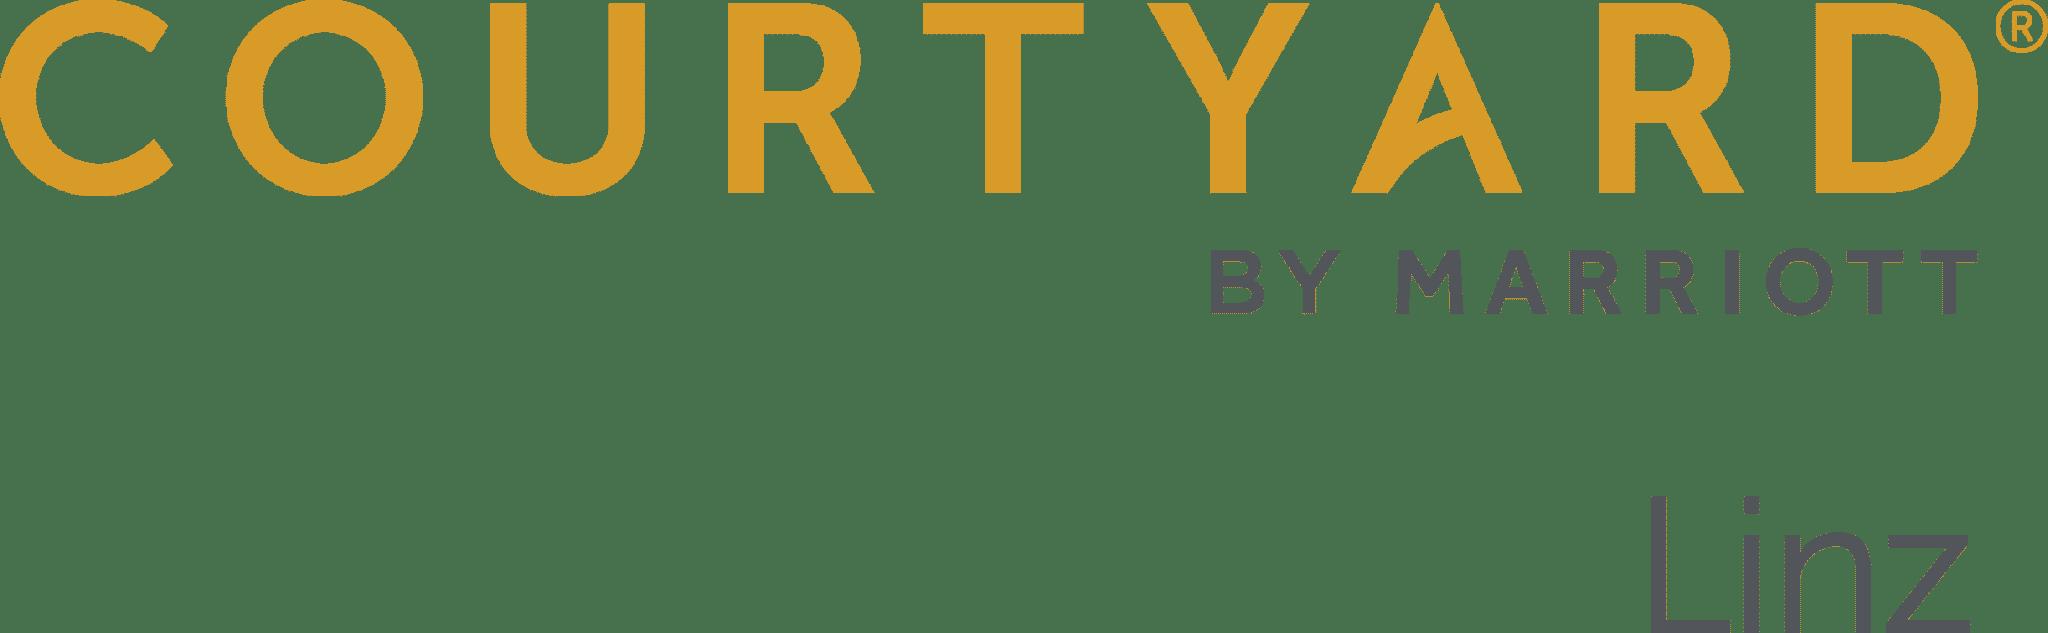 Courtyard by Marriott Linz Logo